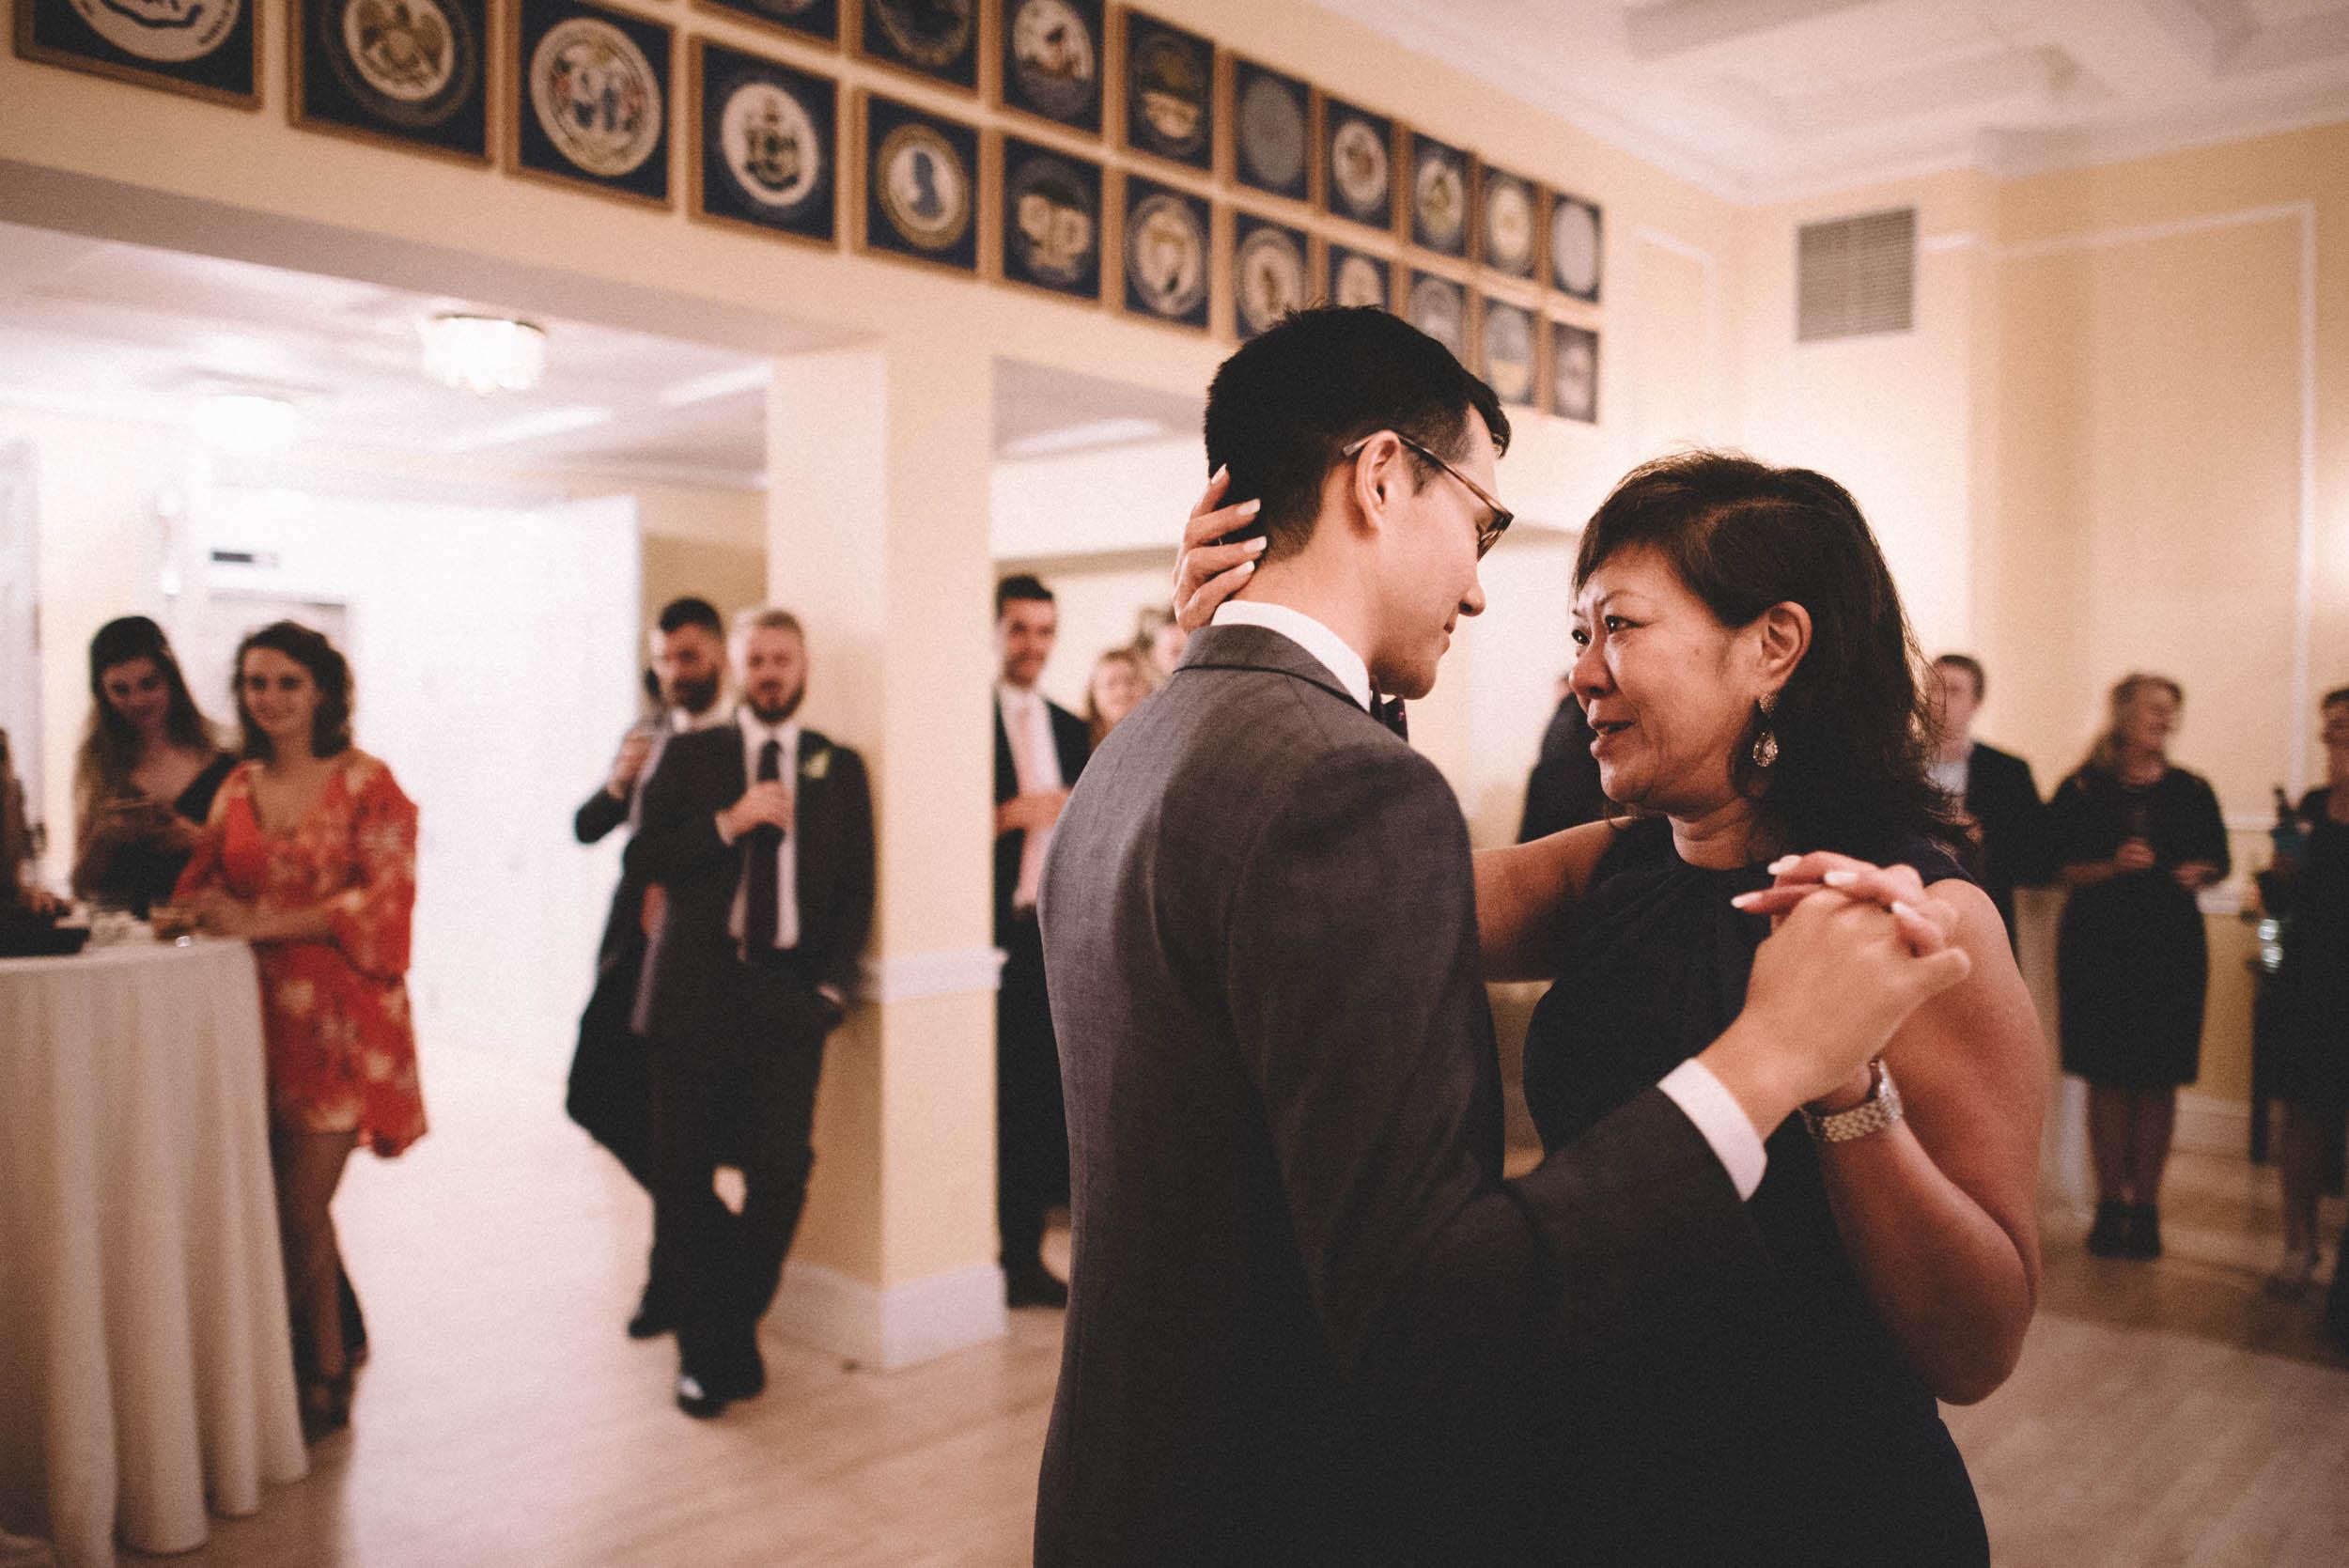 Dumbarton-House-wedding-79.jpg